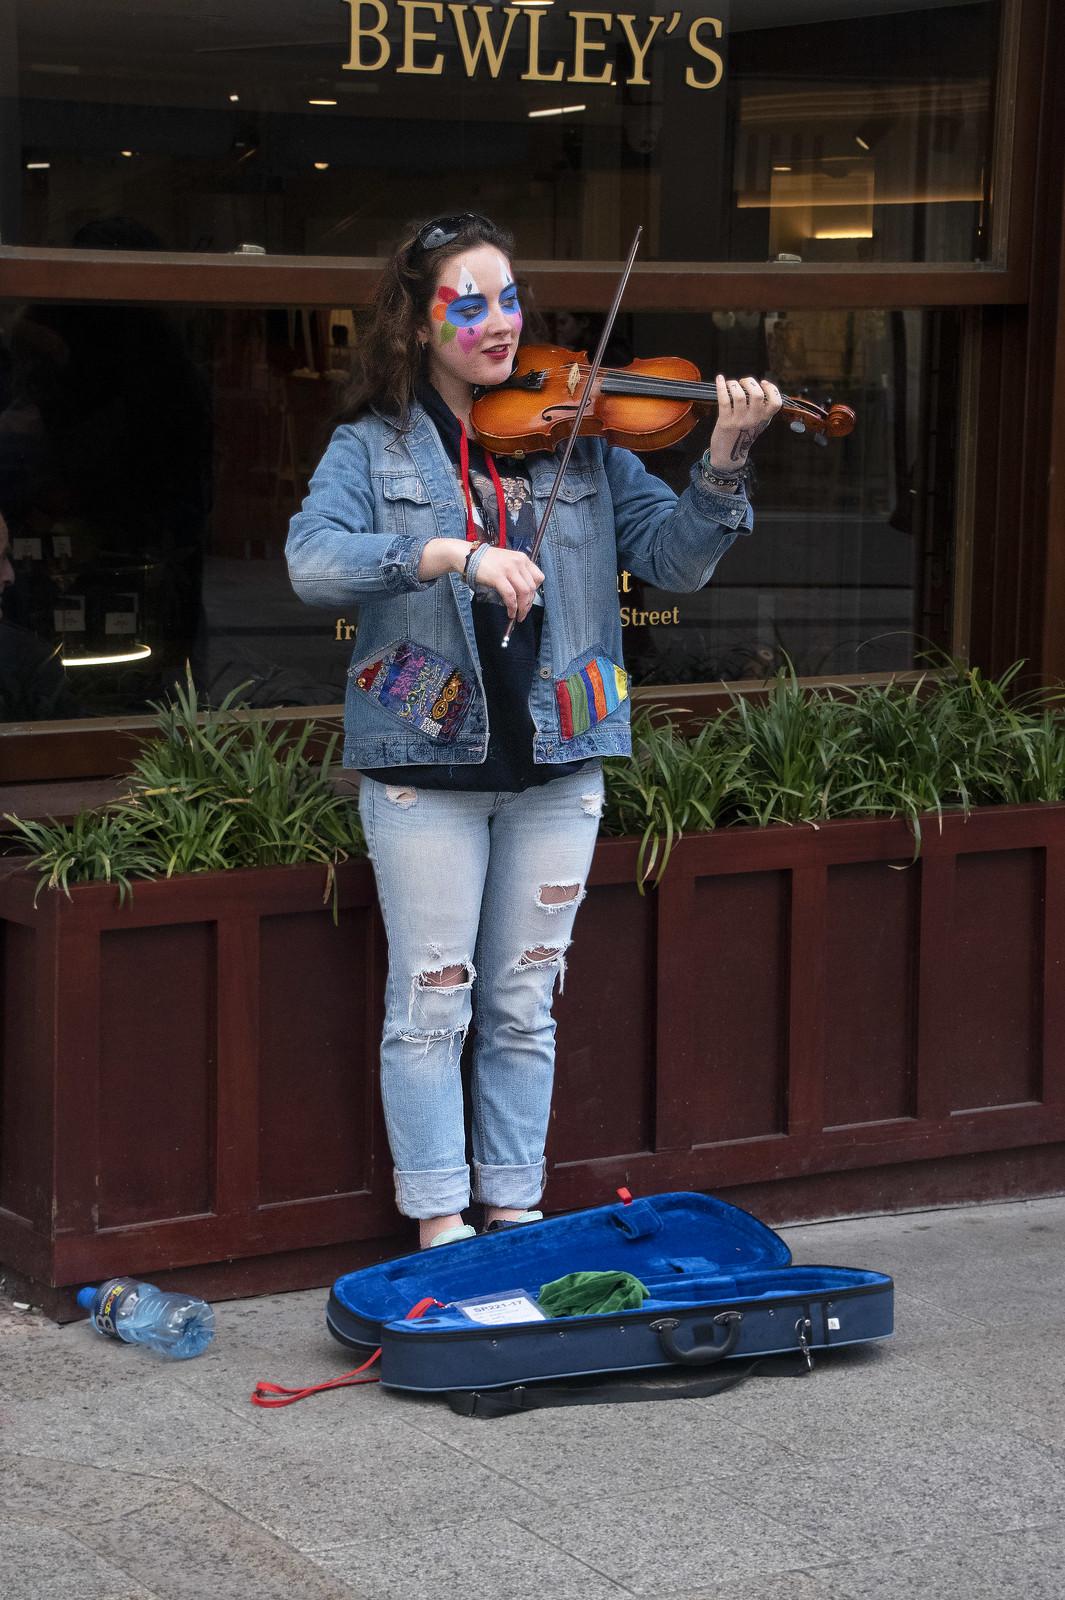 Busker at Bewley's -- 78-79 Grafton Street Dublin (Ireland) April 2018